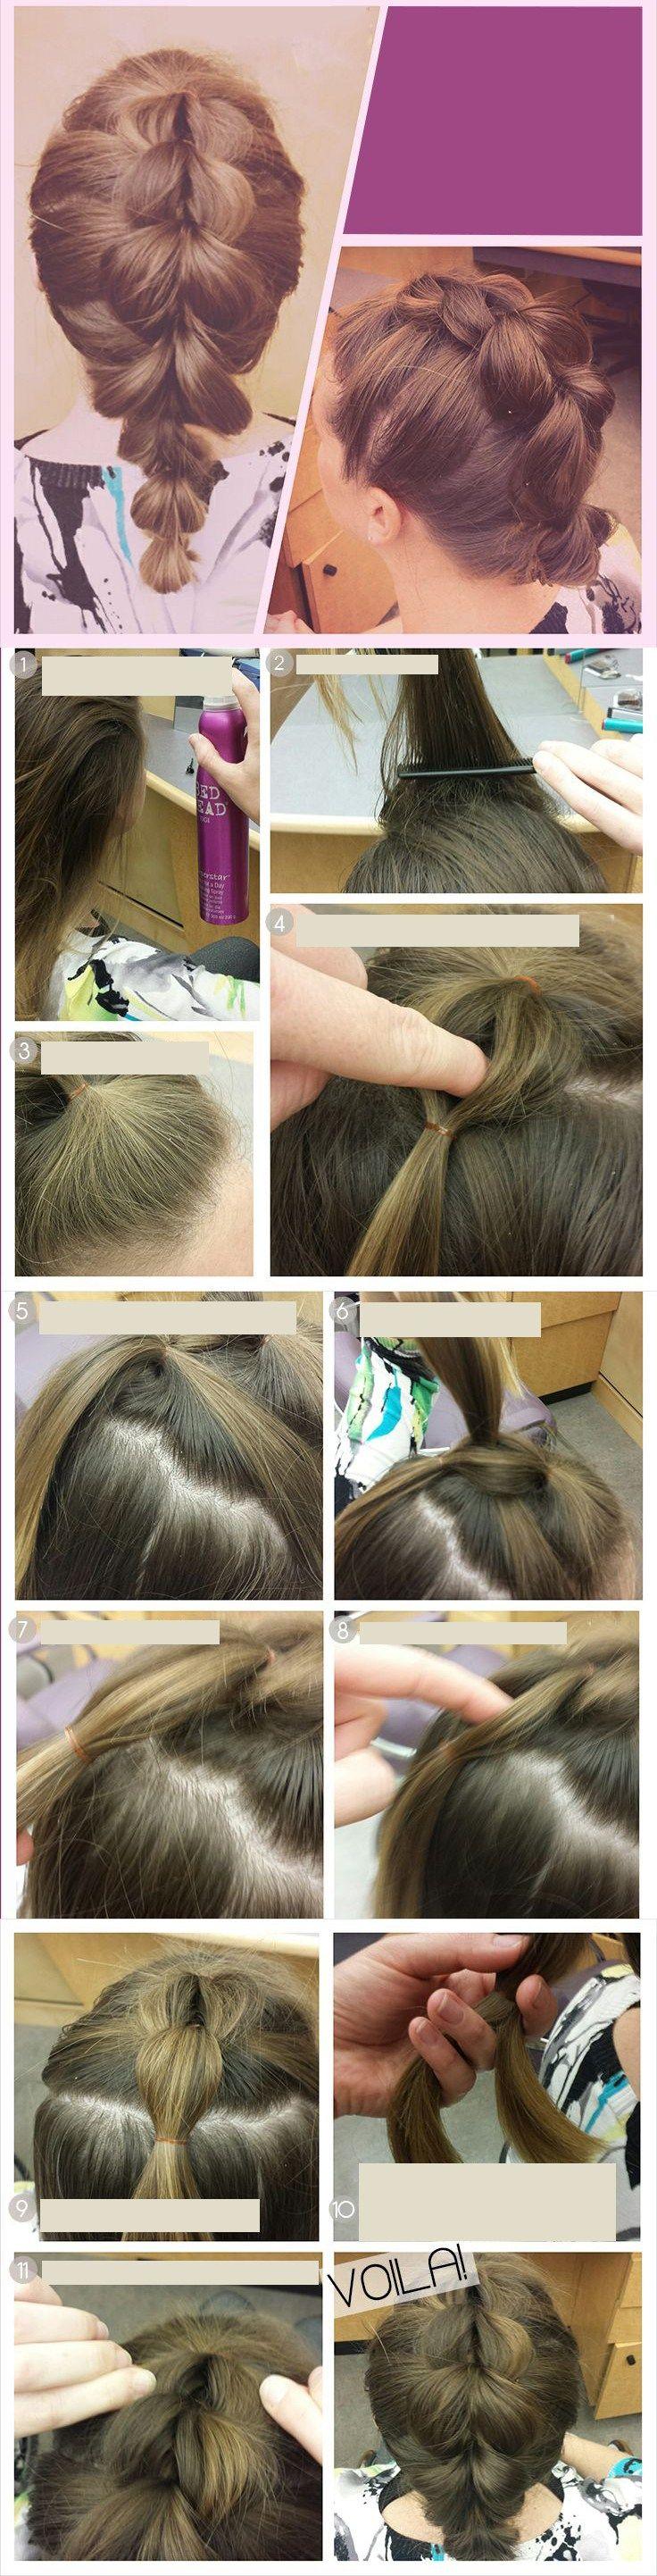 how to do a fish plait braid